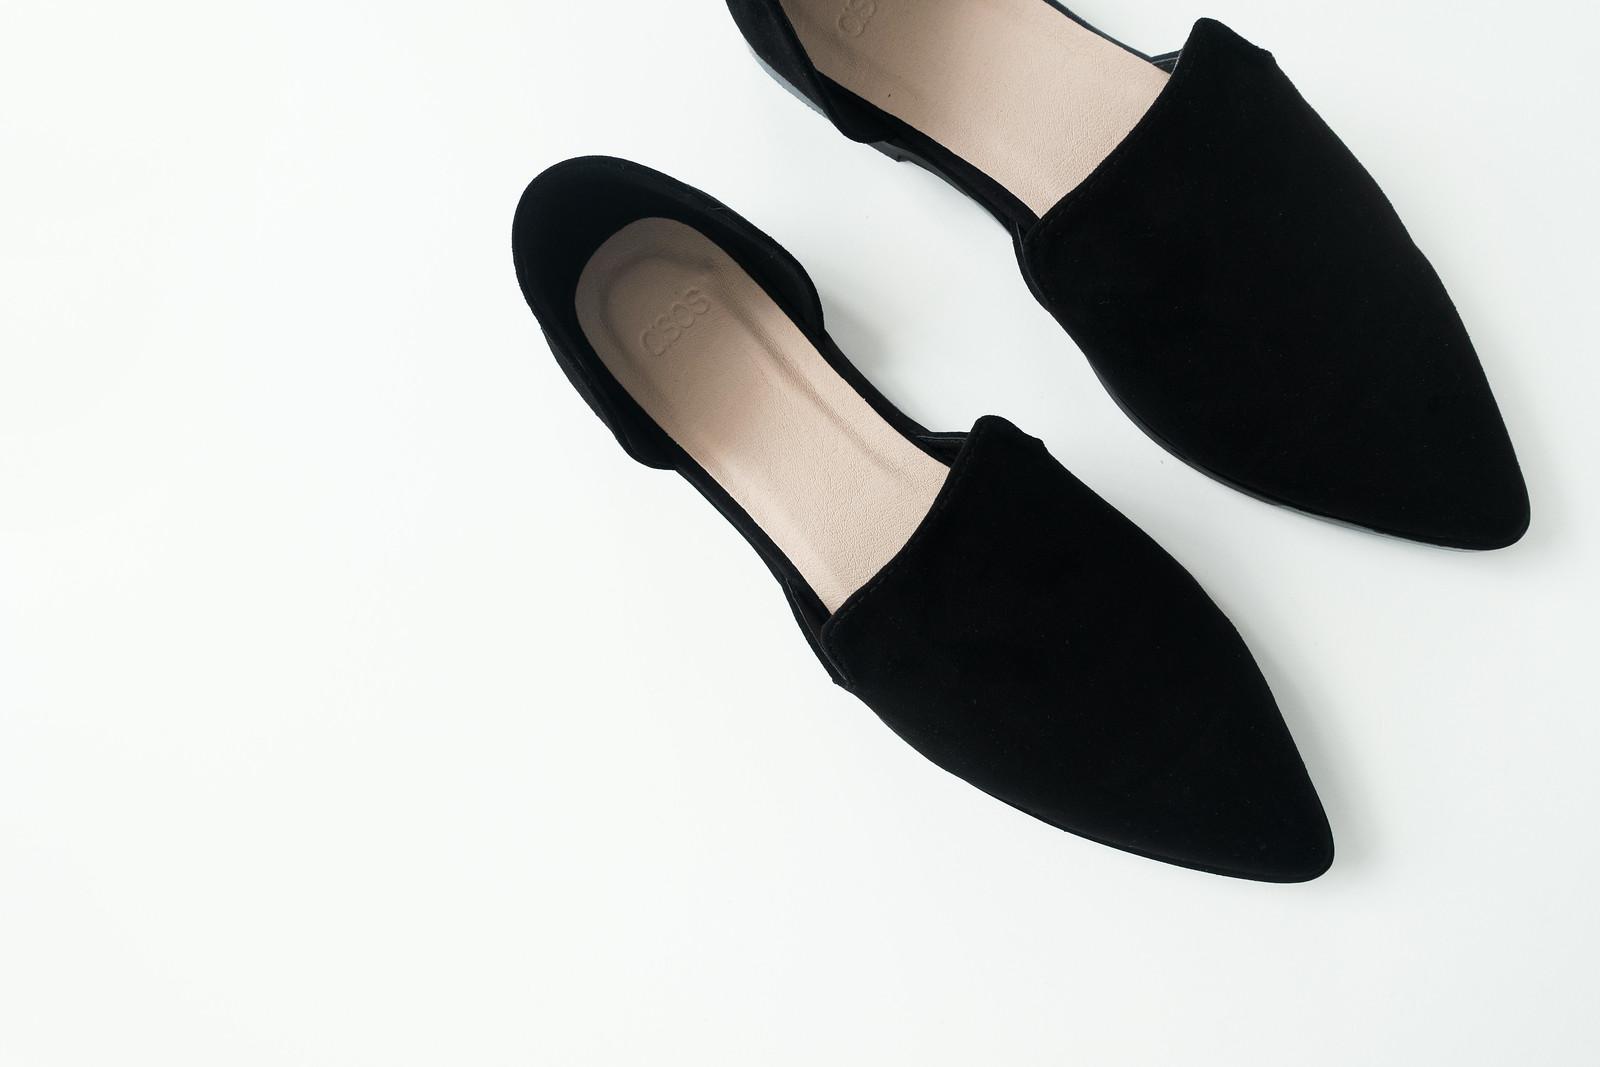 The Minimal Wardrobe: Practical Shoes